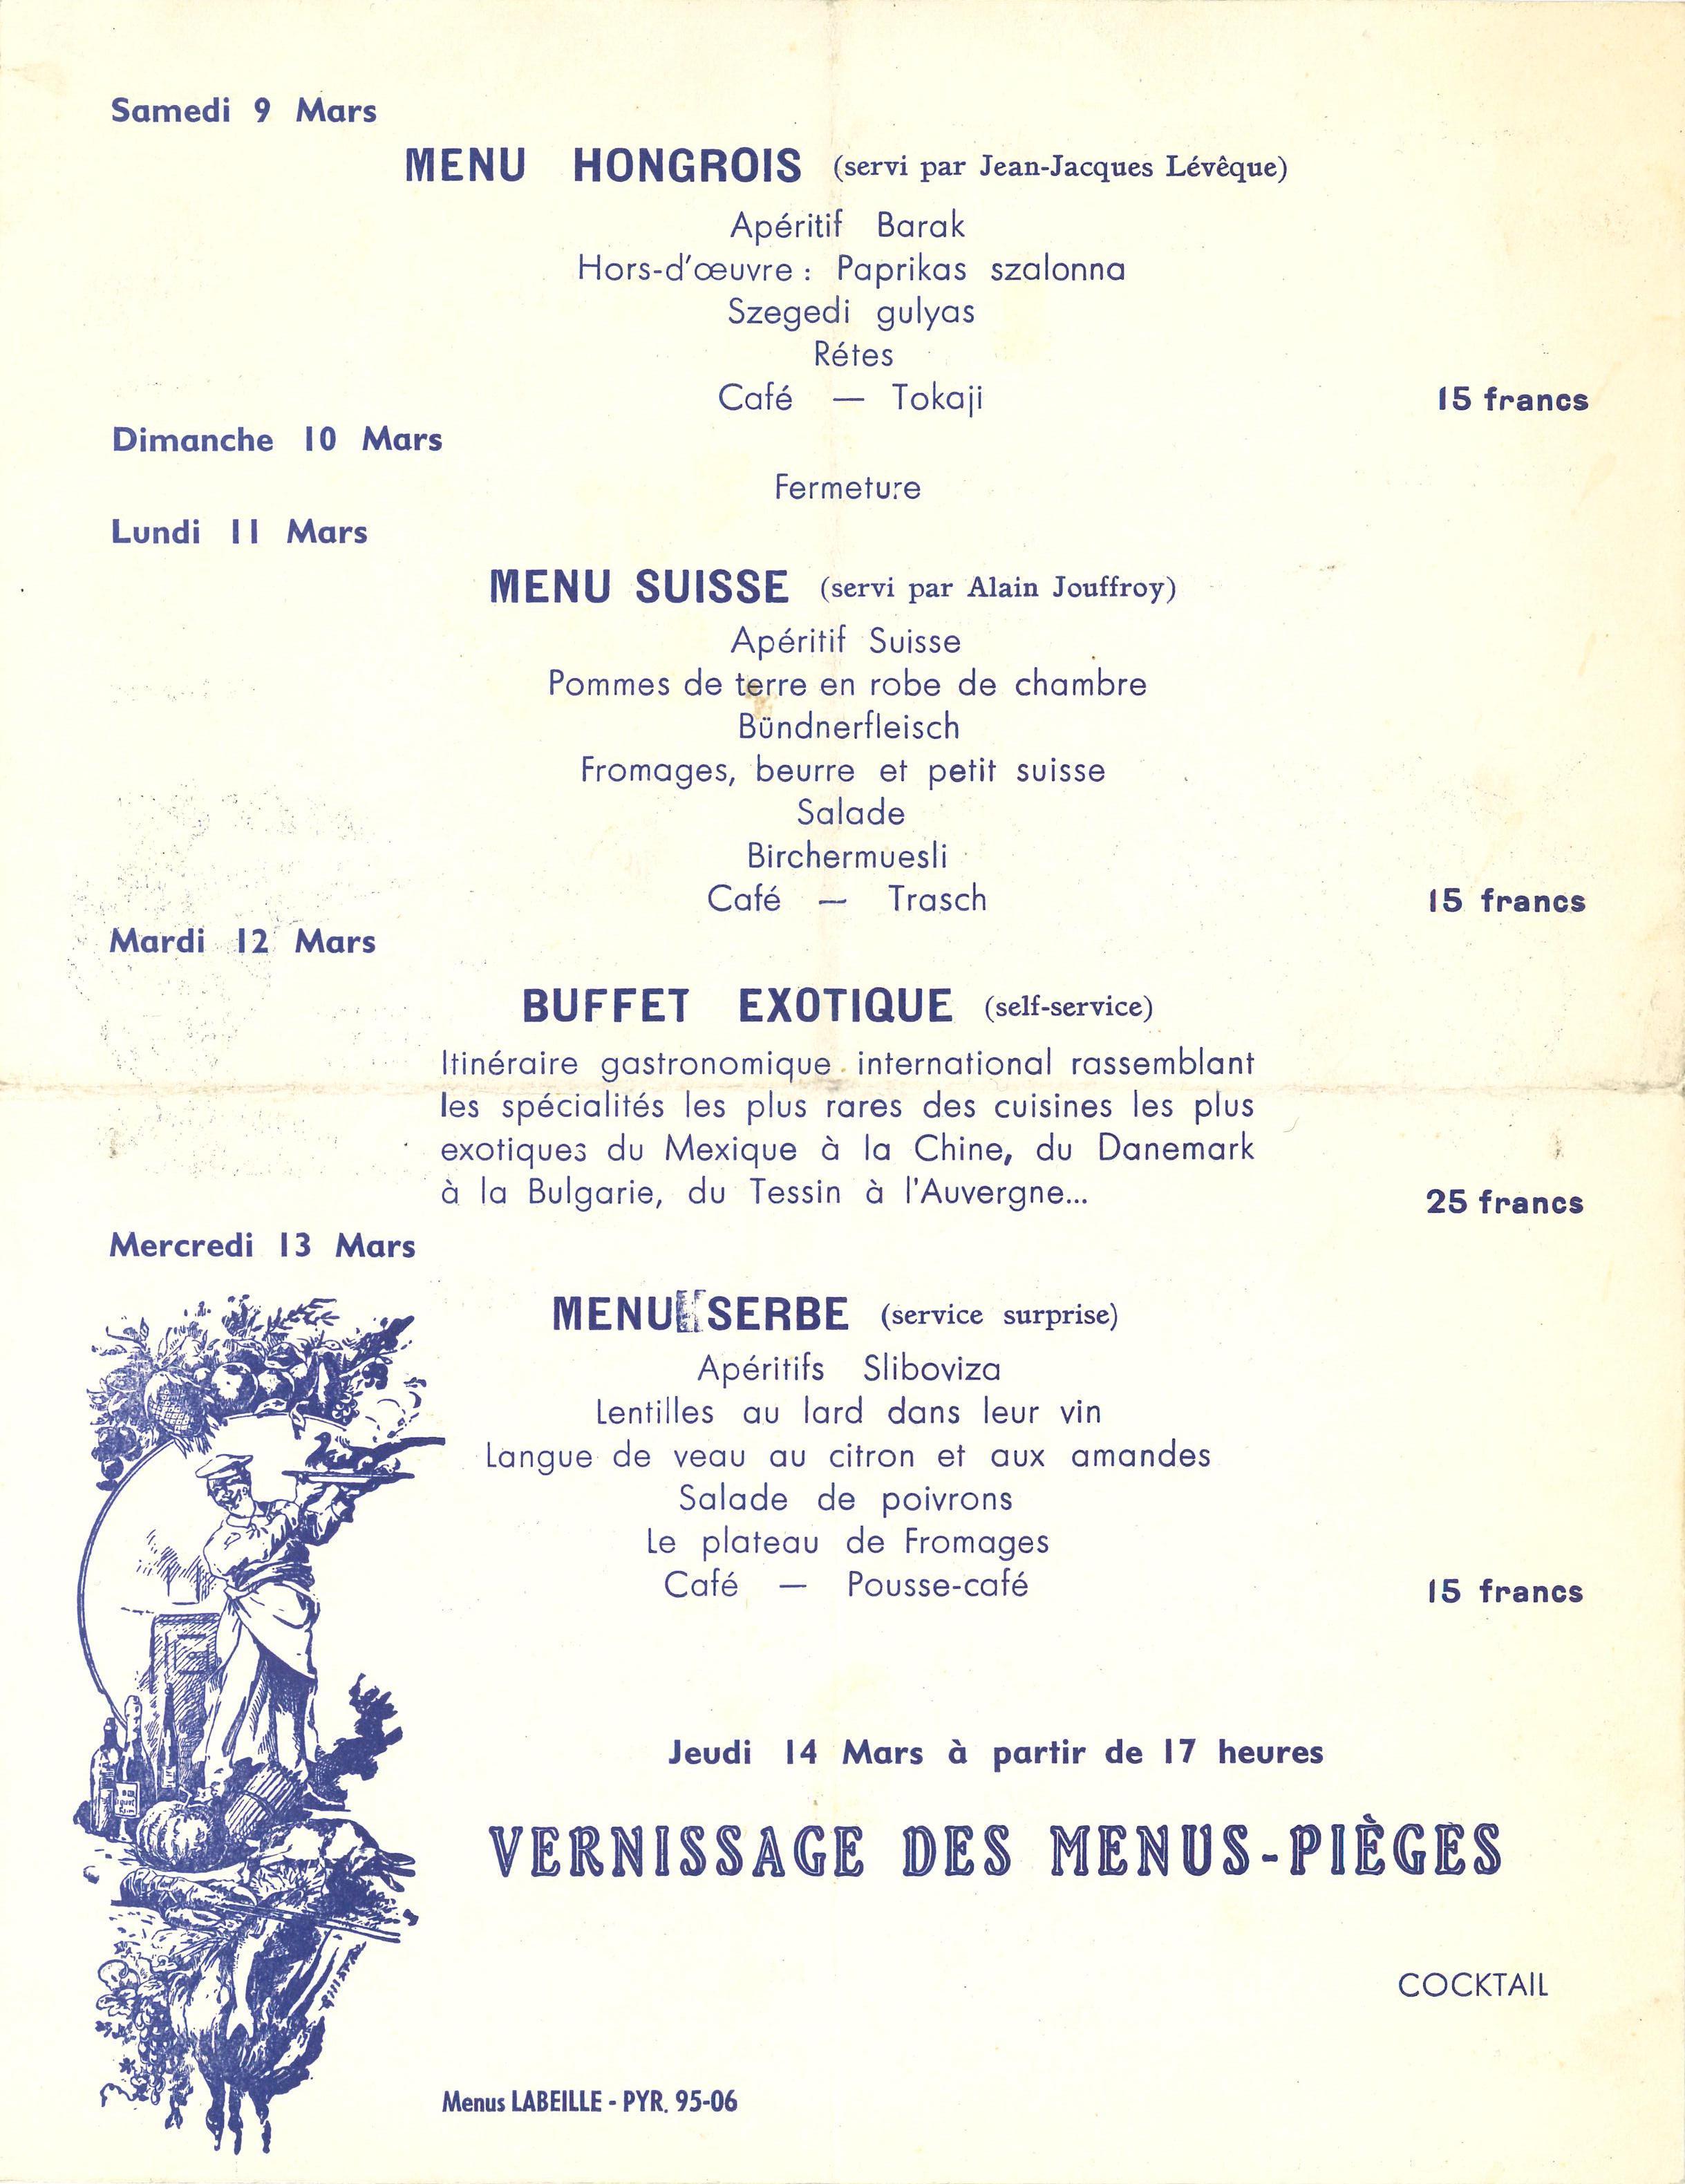 Daniel Spoerri, invitation/menu. Restaurant de la Galerie J. Paris, Galerie J, 1963; Archiv der Avantgarden, Staatliche Kunstsammlungen Dresden © VG Bild-Kunst, Bonn